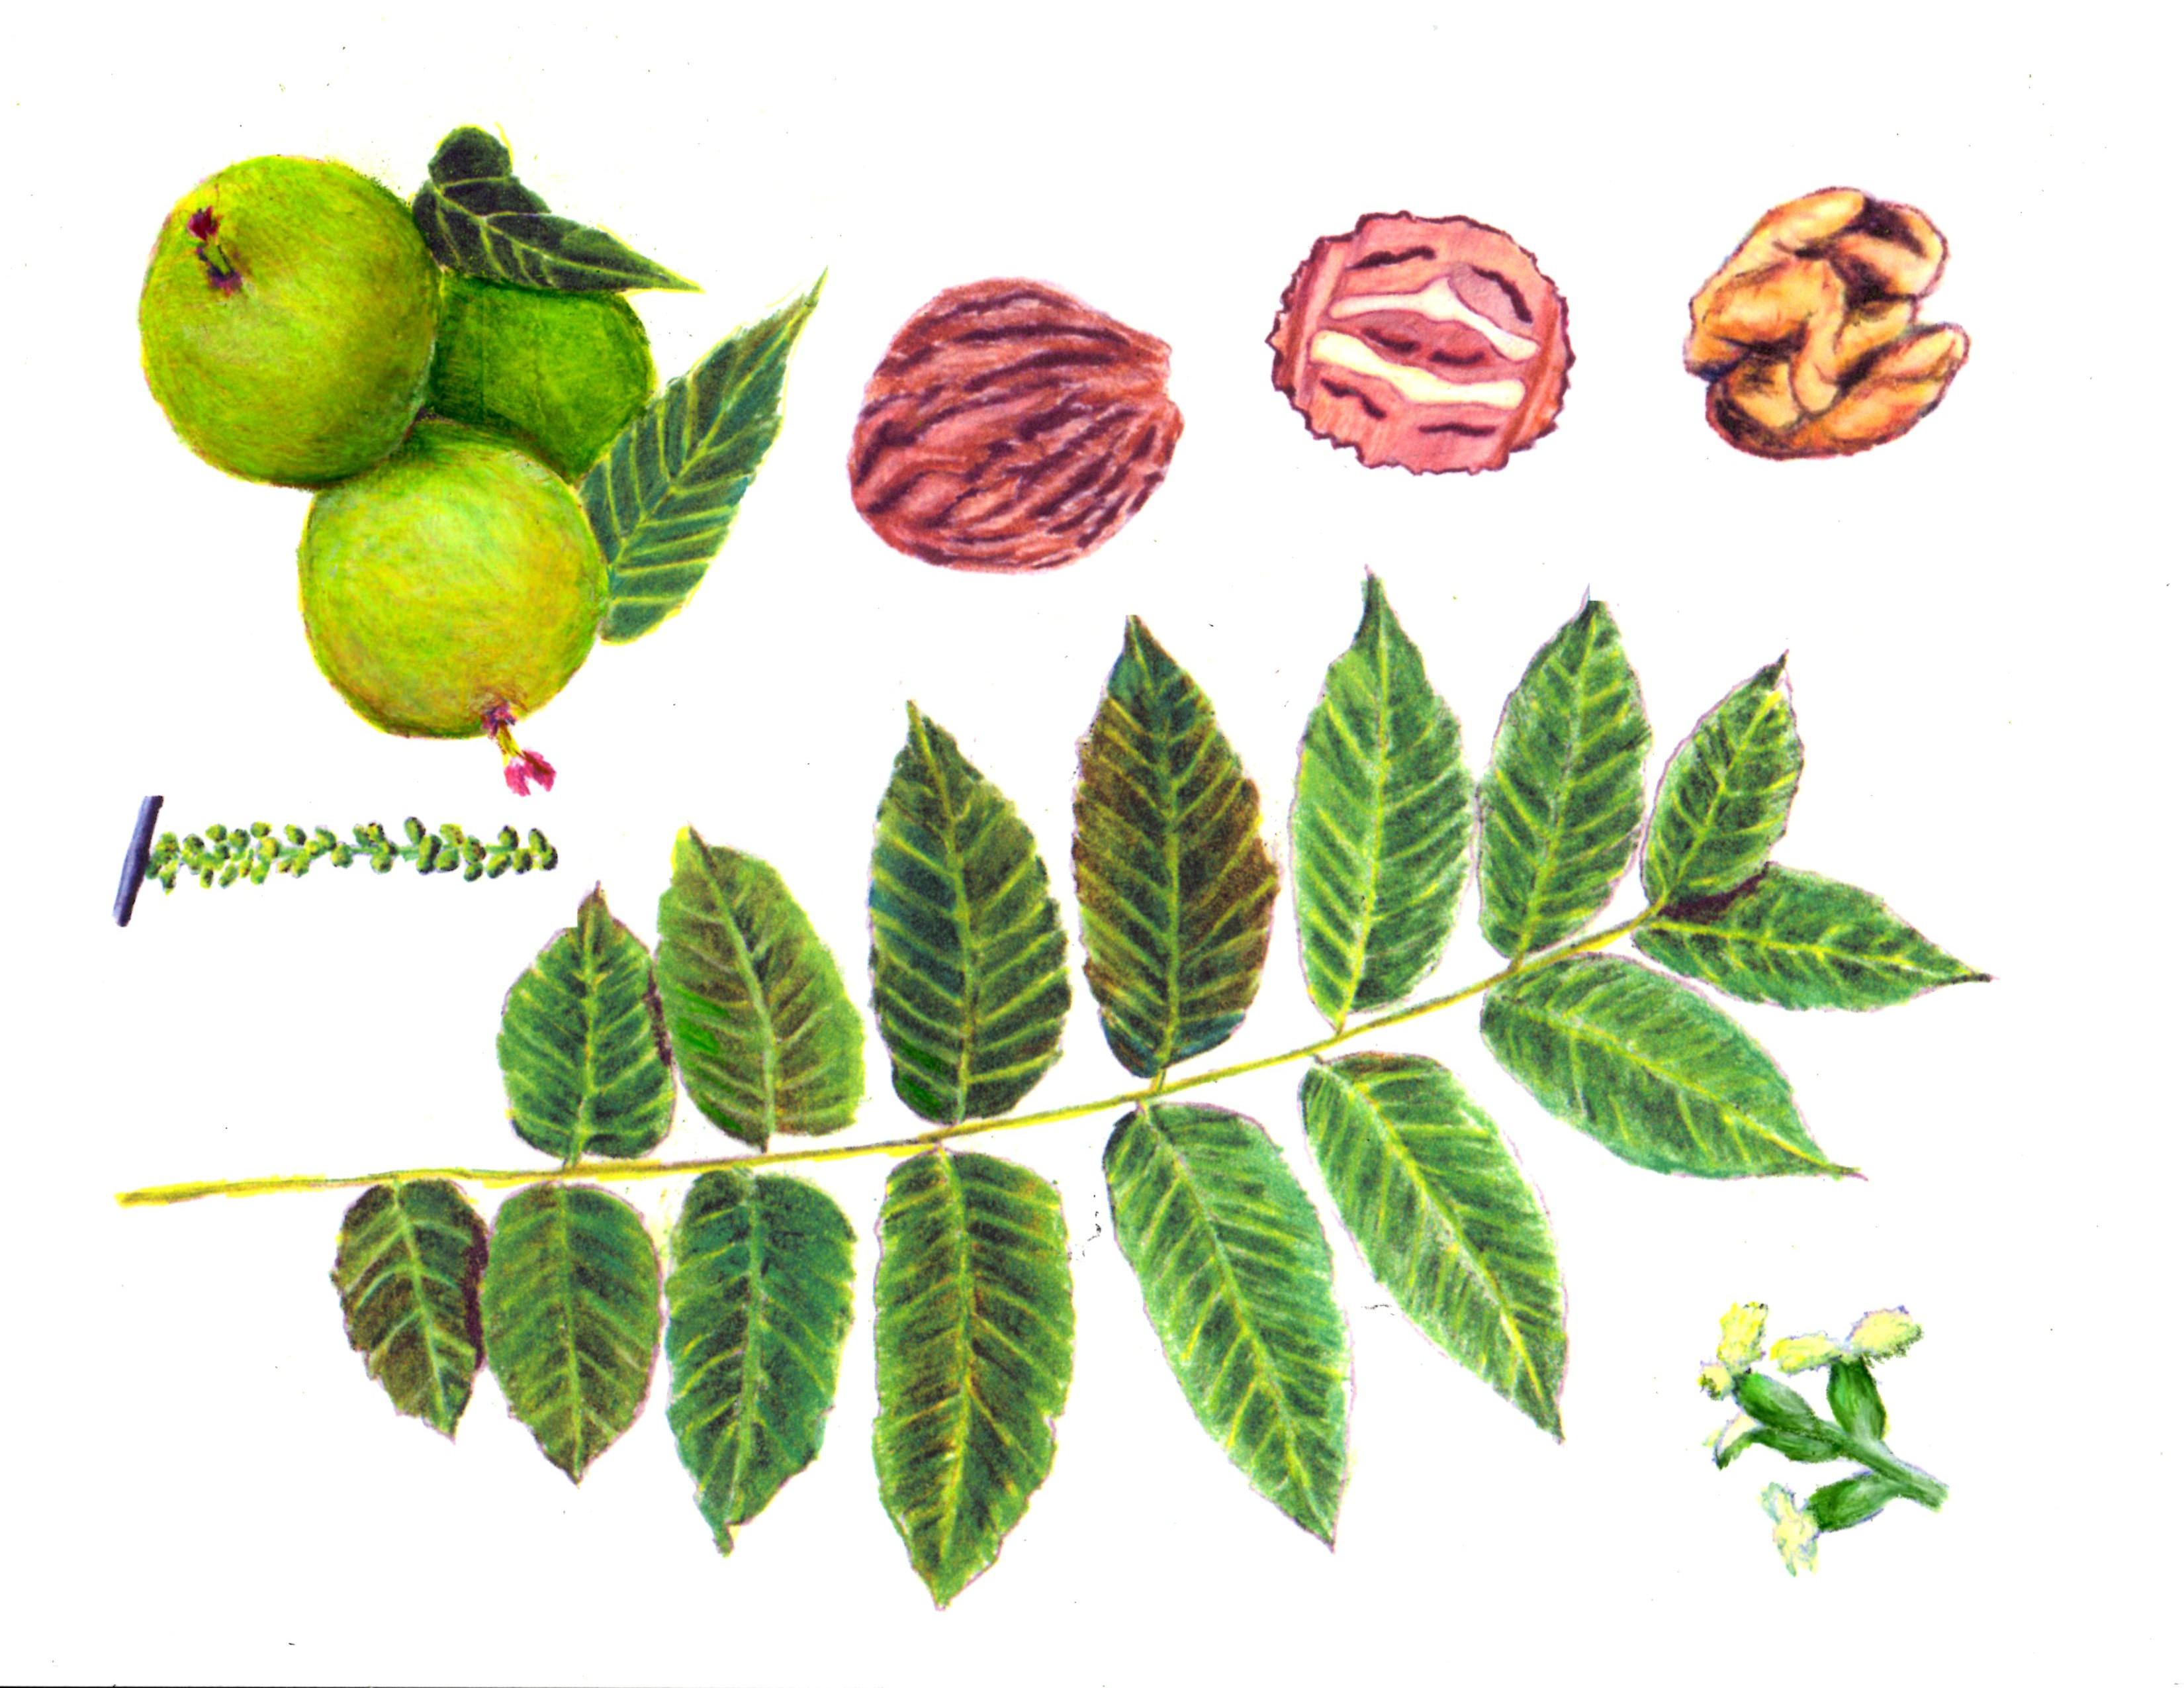 Illustration of the black walnut parts: leaf, male catkin, nuts with husks, nut, kernel, and female flowers. Illustration by Karen M. Johnson